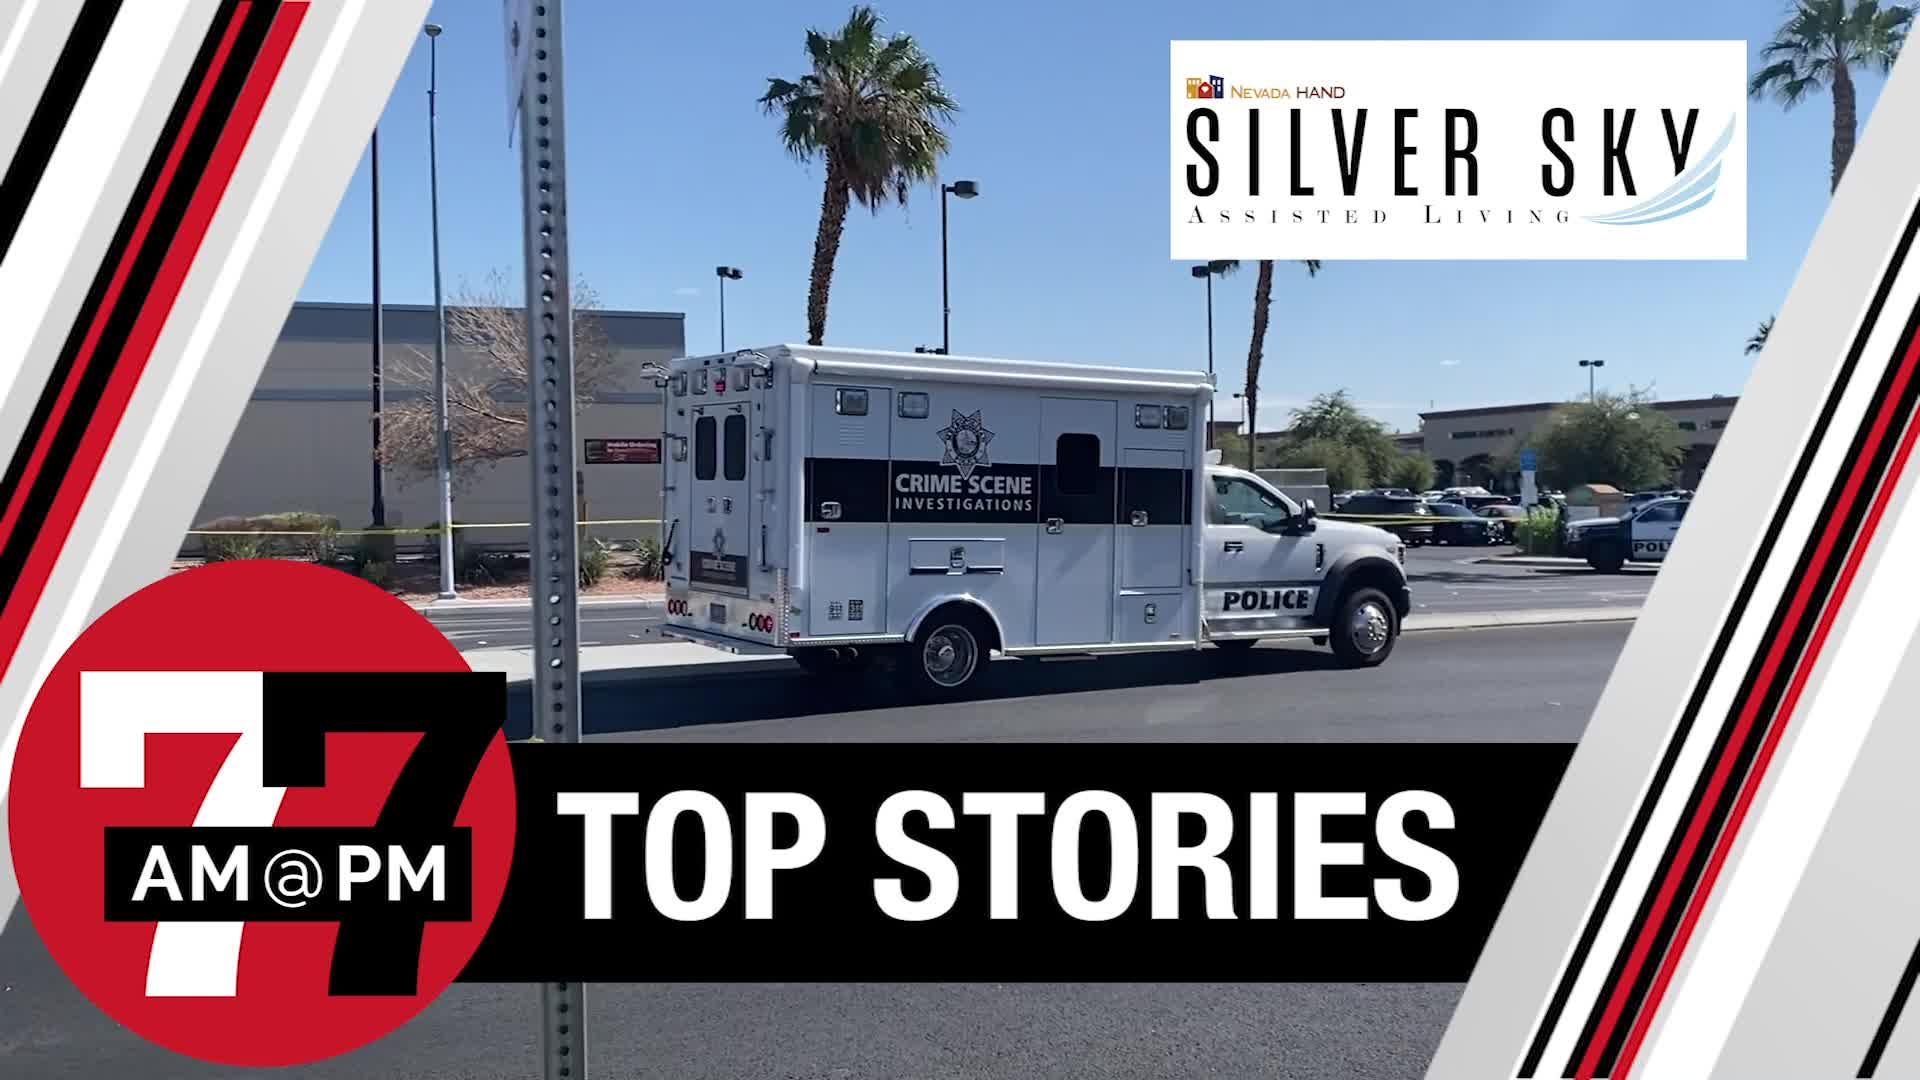 7@7PM Deadly Officer-Involved Shooting in NE Las Vegas